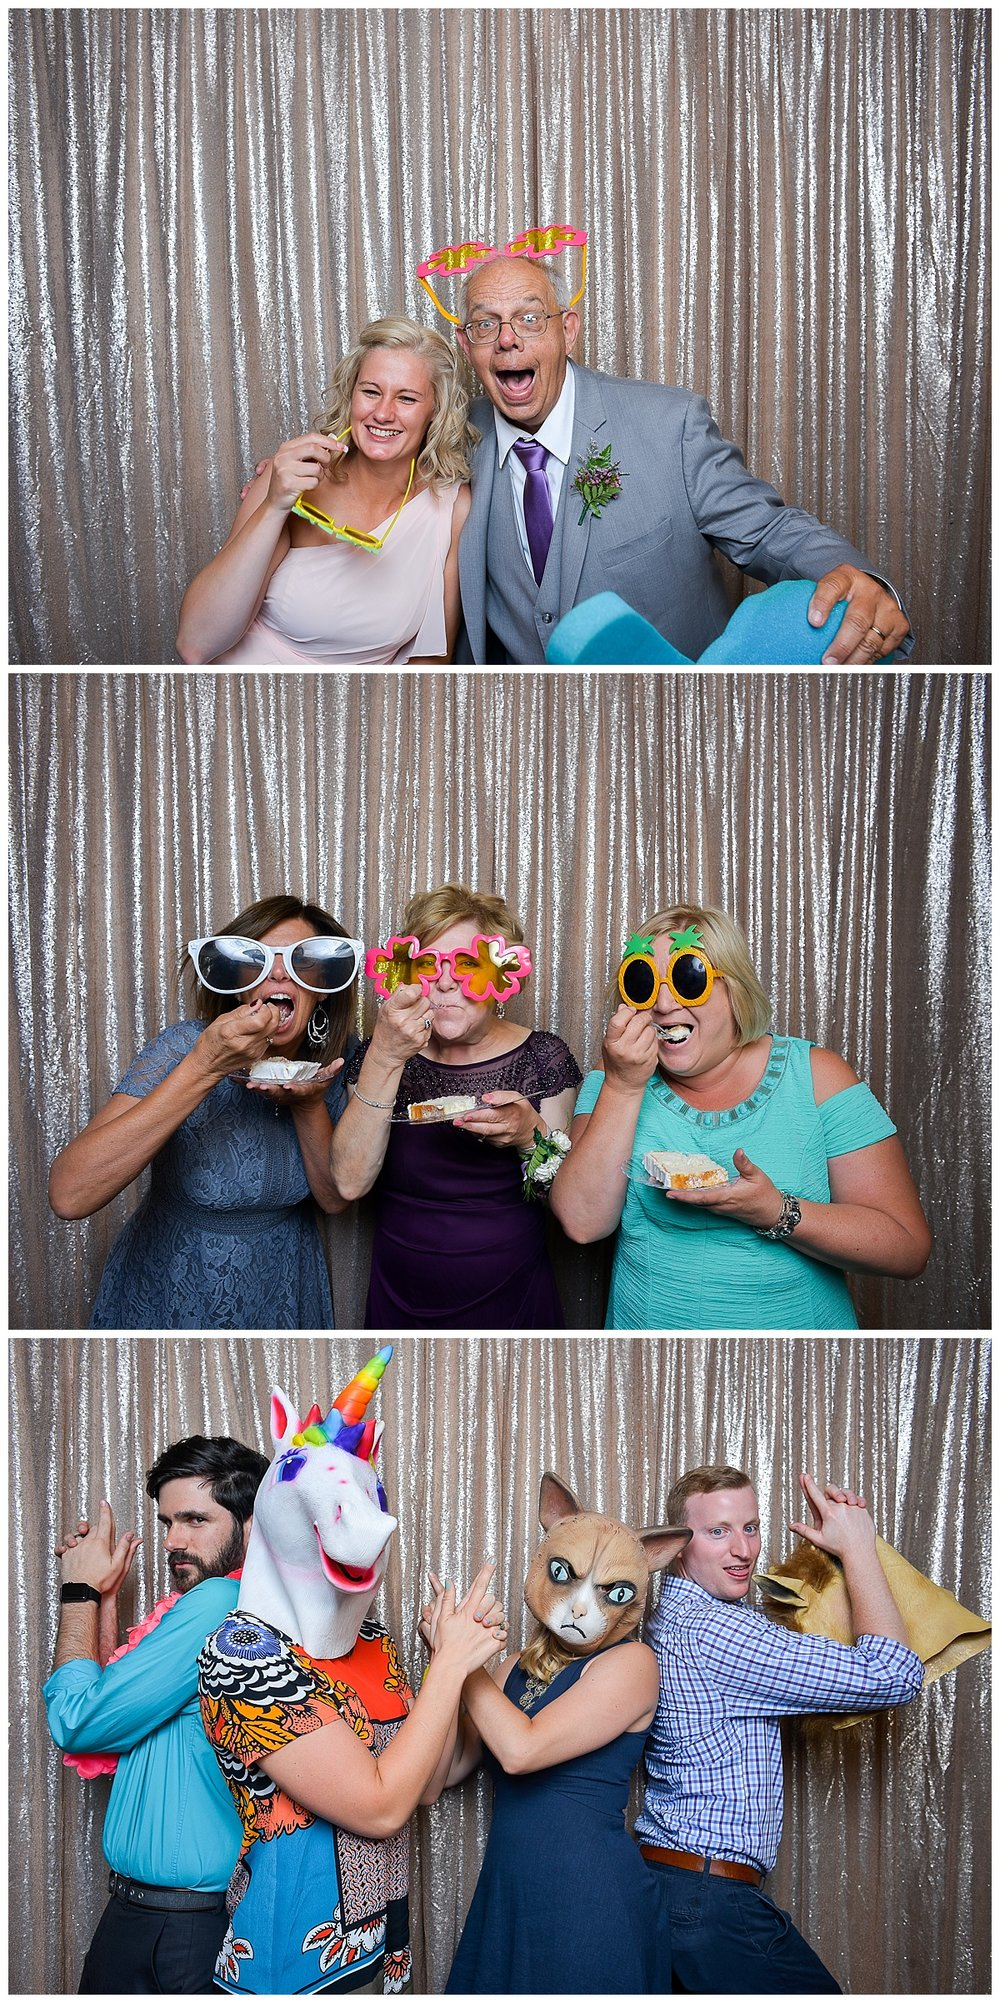 Brittney + Paul | Wedding Day | Aloha Booth | Wedding Day | Aloha Booth | Wedding Day | Aloha Booth